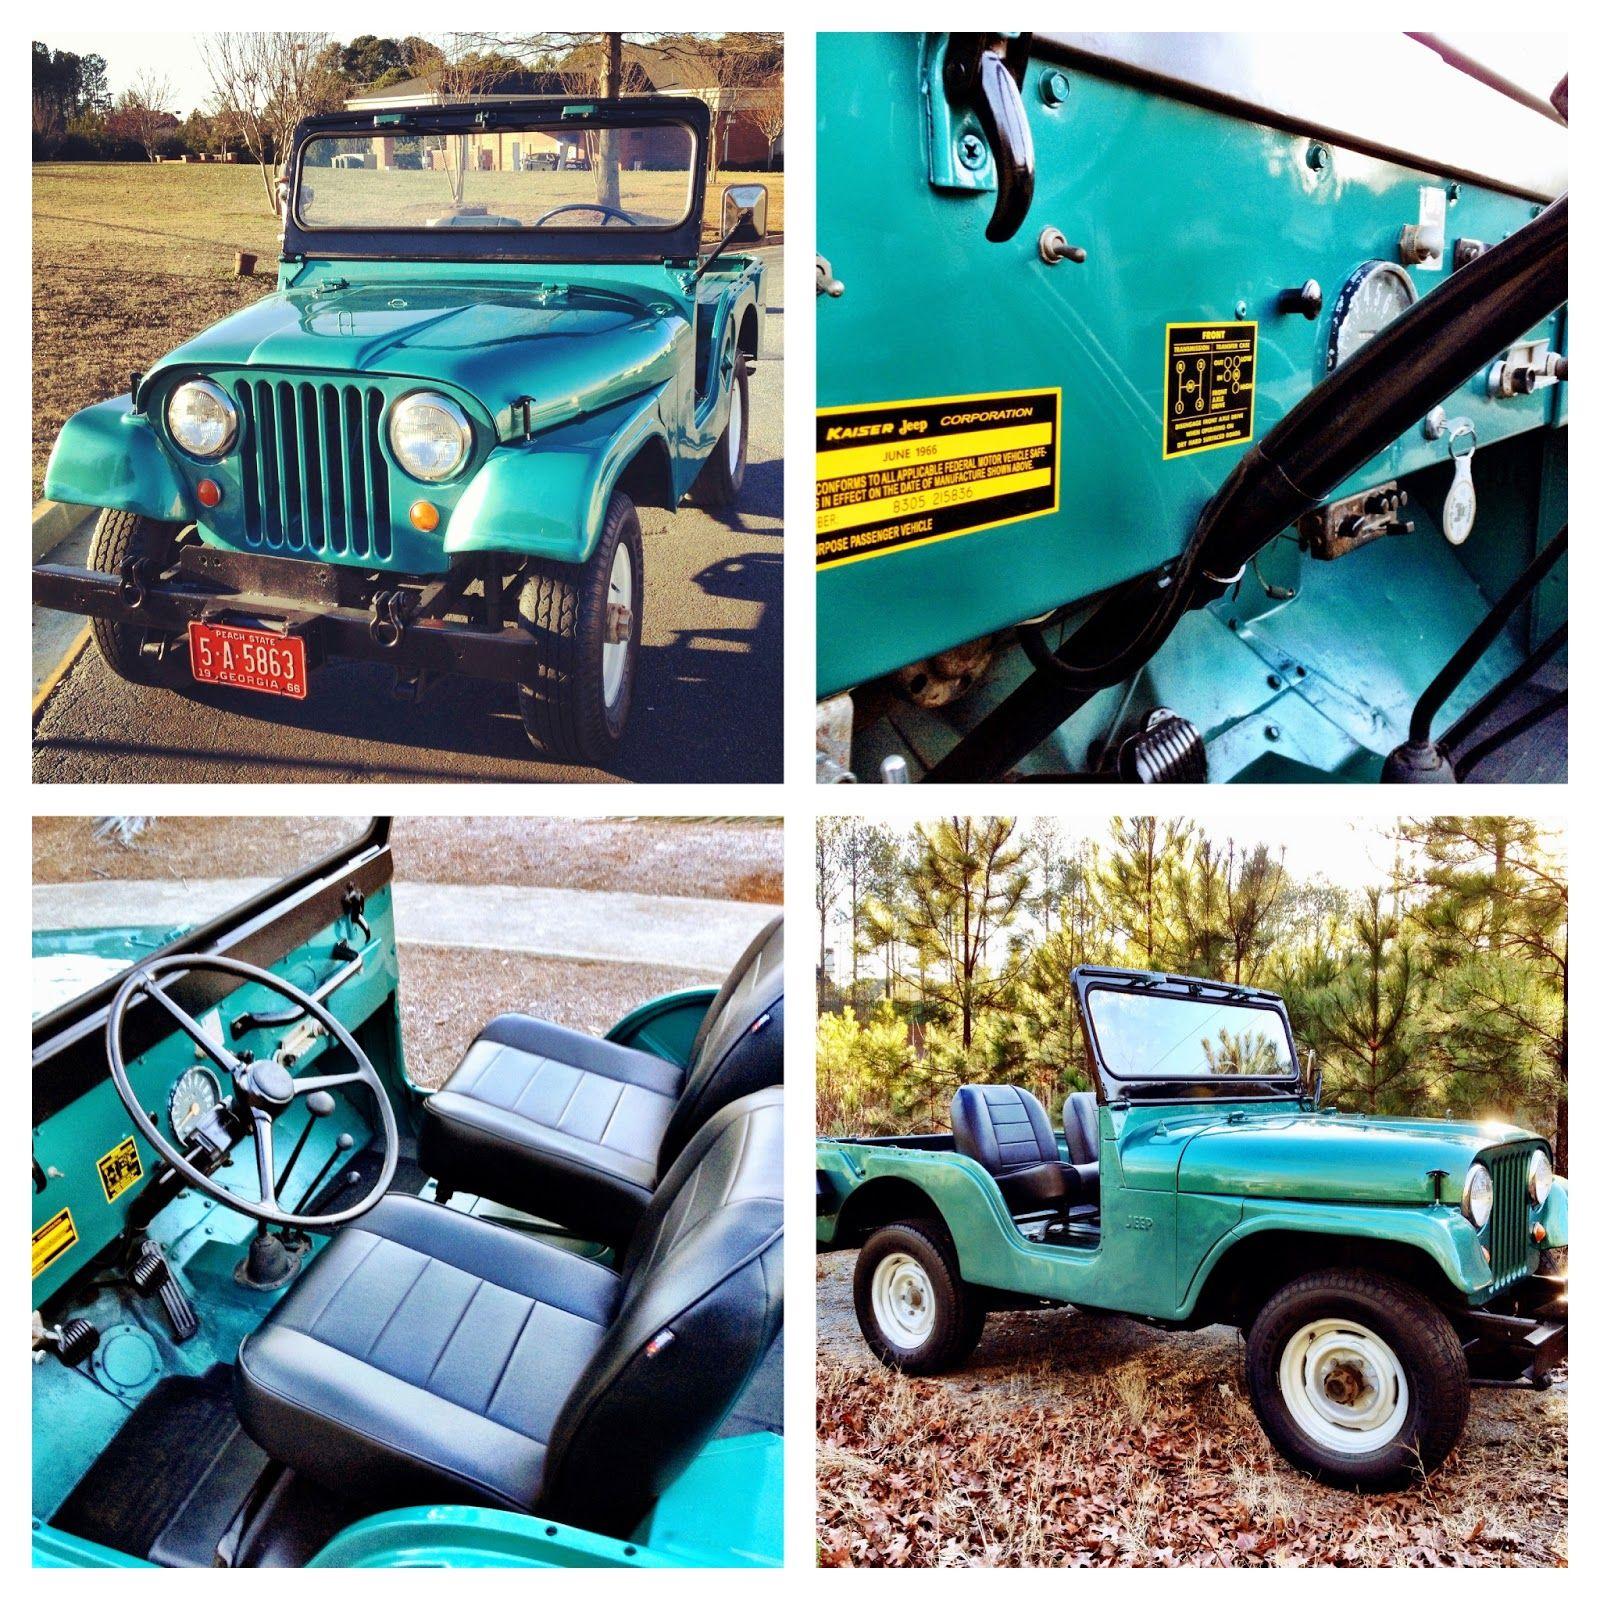 Vintage Jeep Store I Vintage Jeep Restorations, Parts And